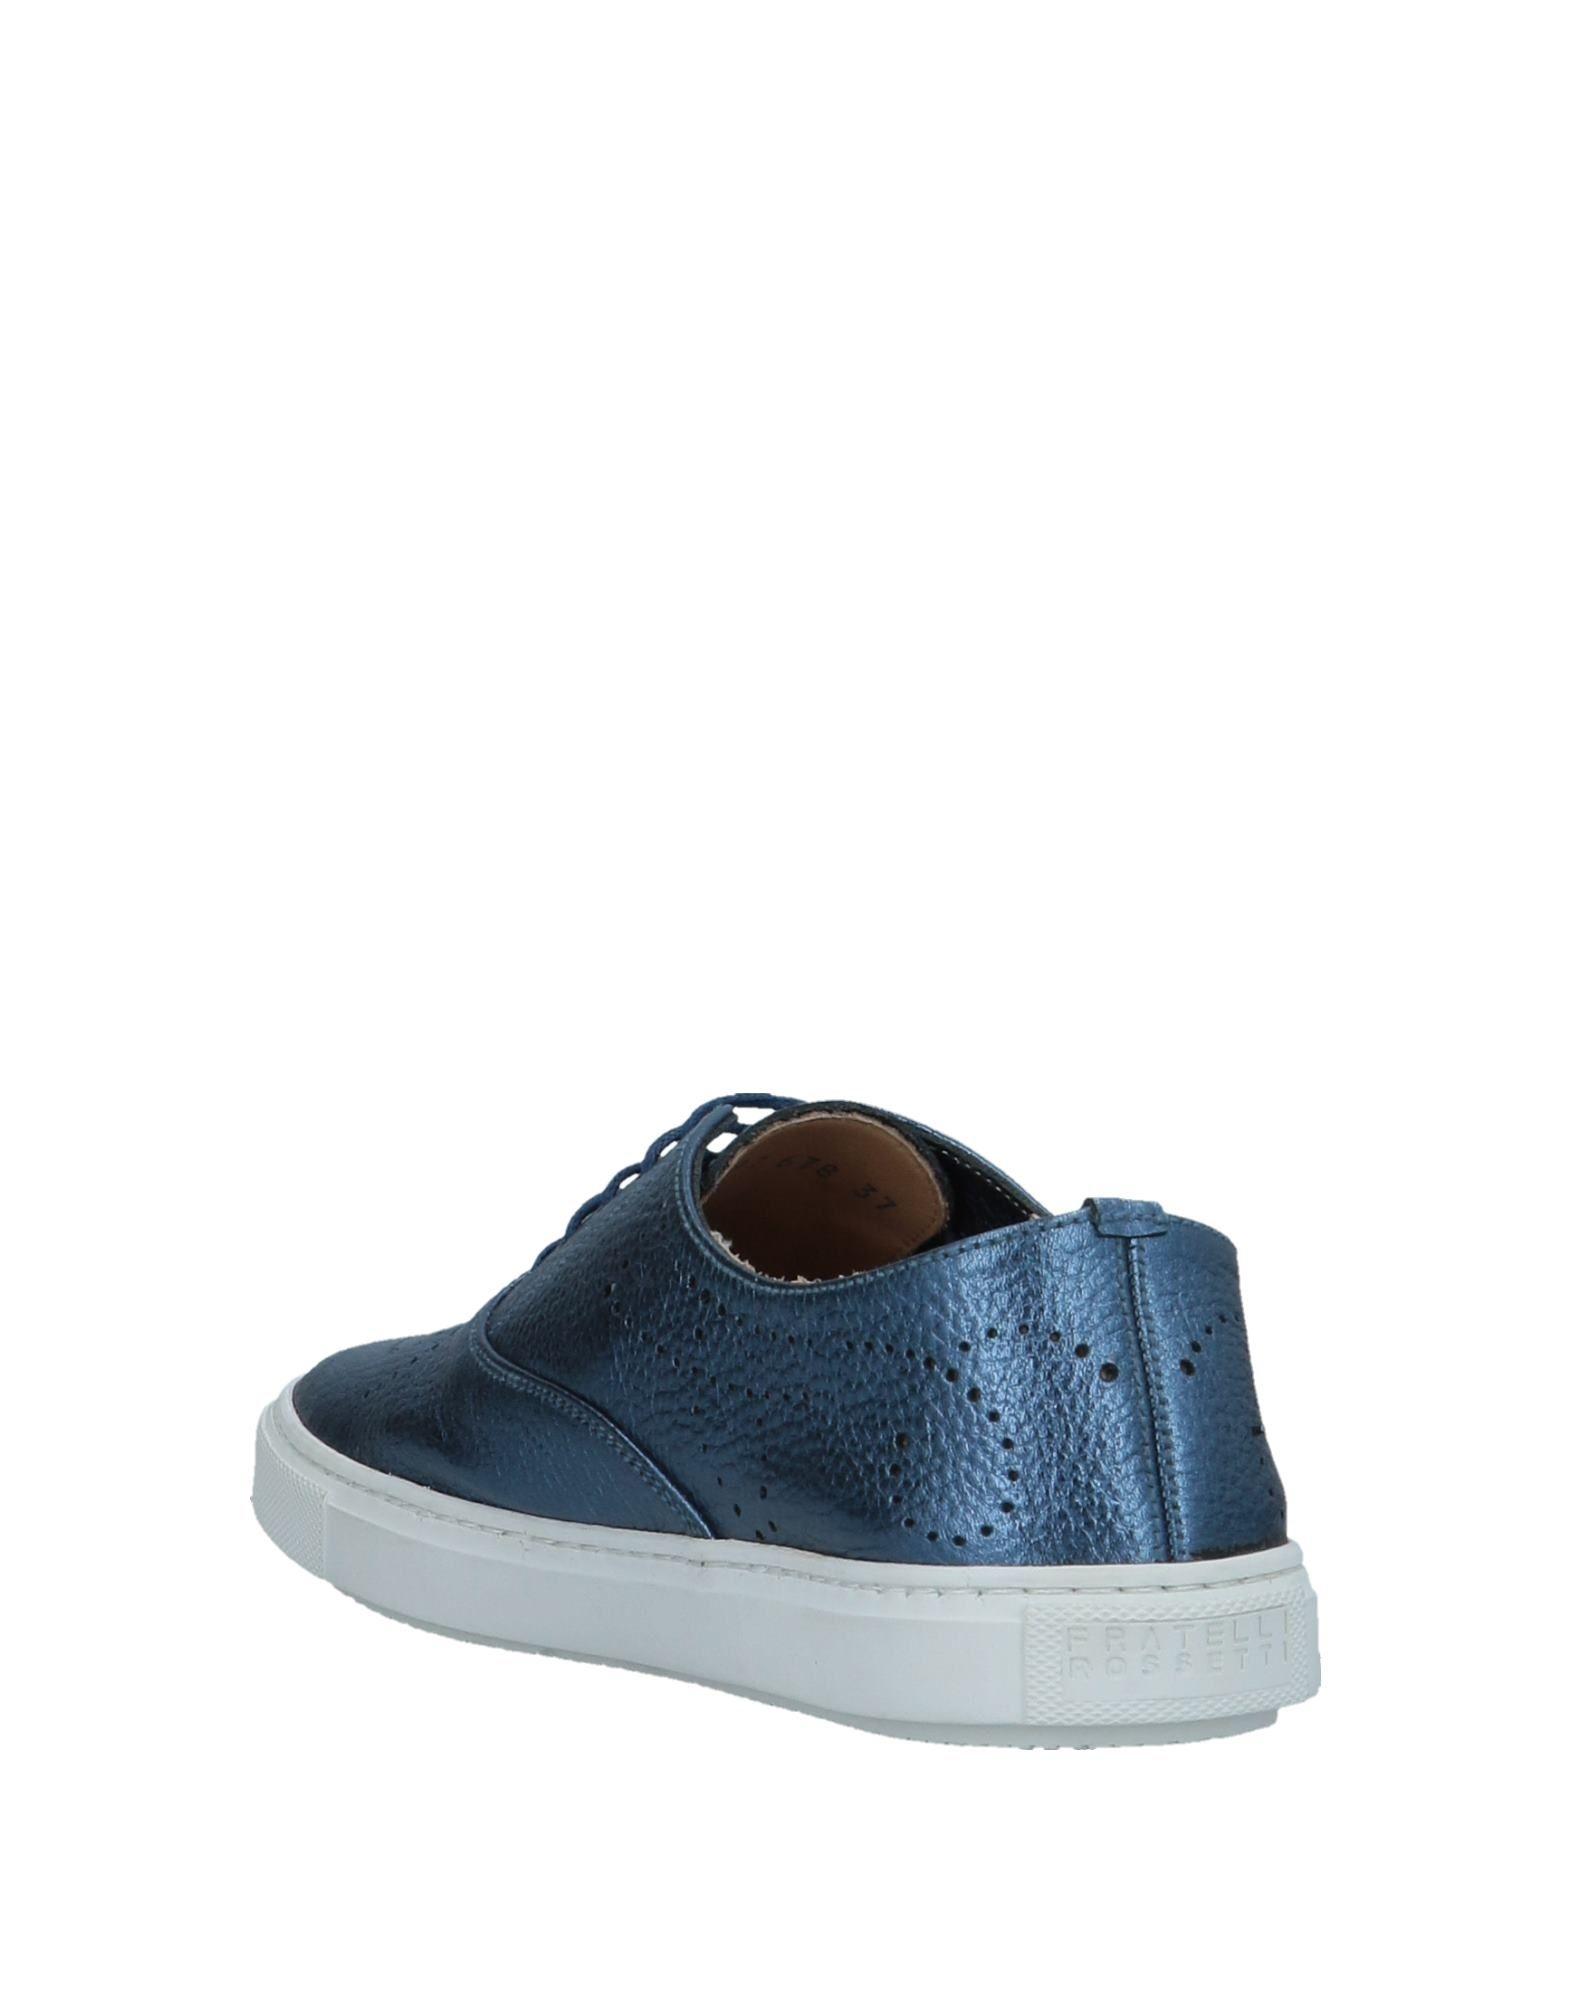 Stilvolle billige Schuhe  Fratelli Rossetti Sneakers Damen  Schuhe 11118233UX a0ec67